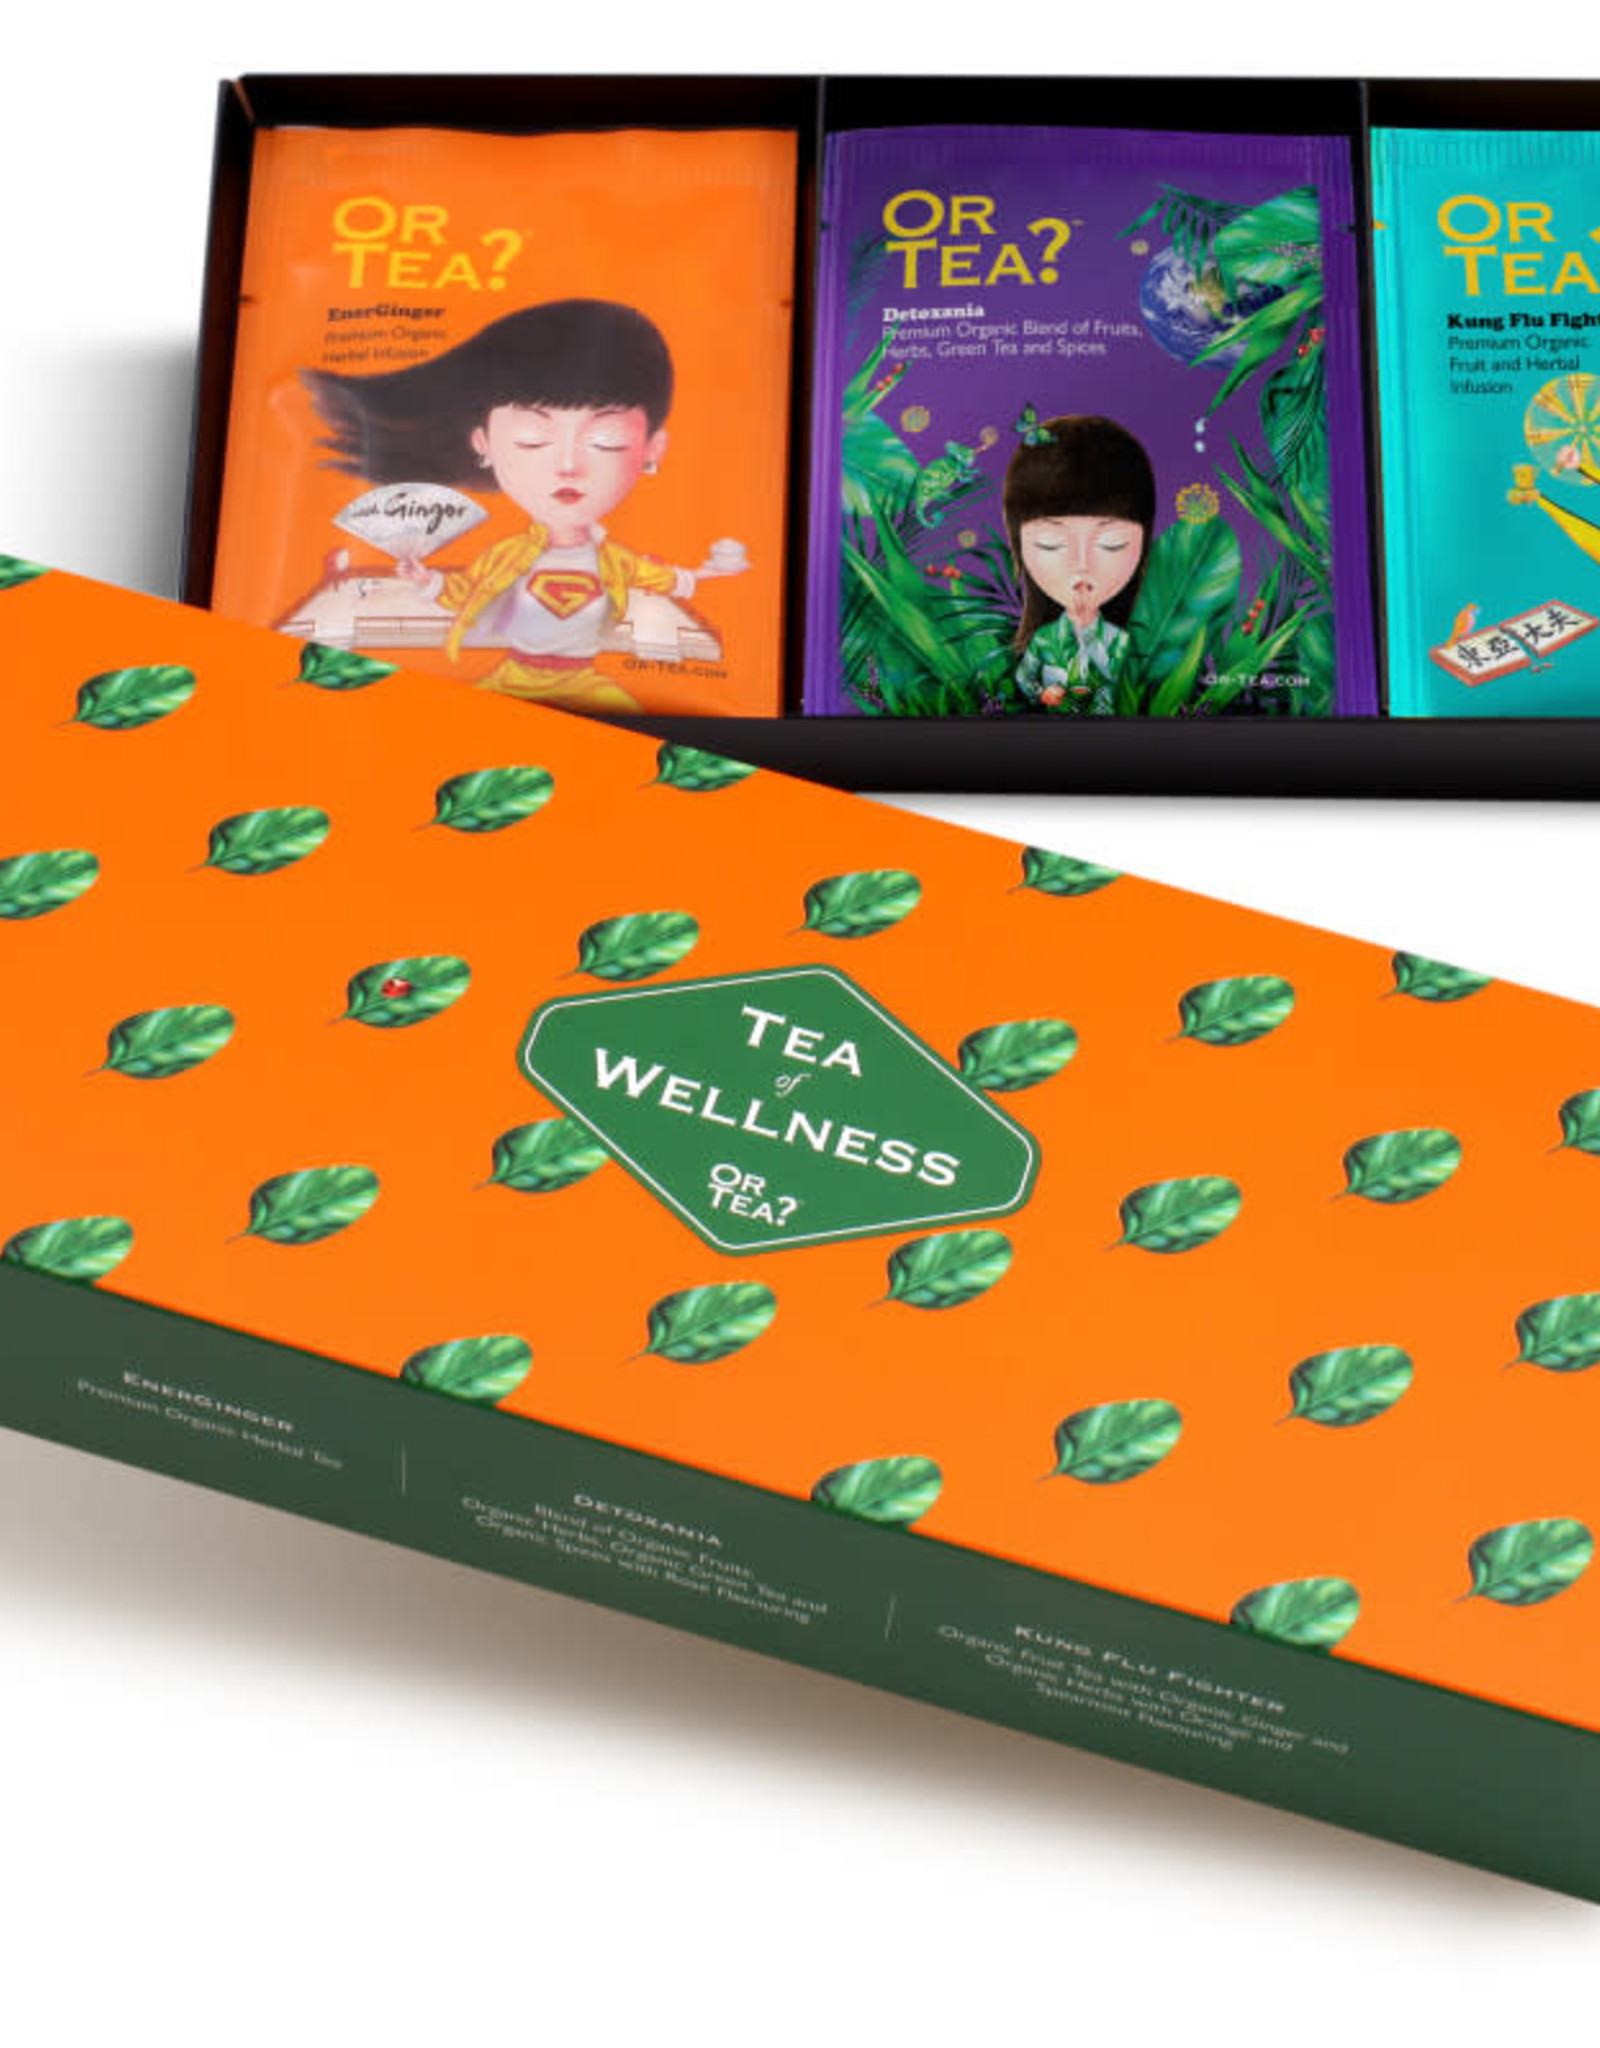 Or tea? or tea? 3-in-1 sachet combo - Tea of Wellness